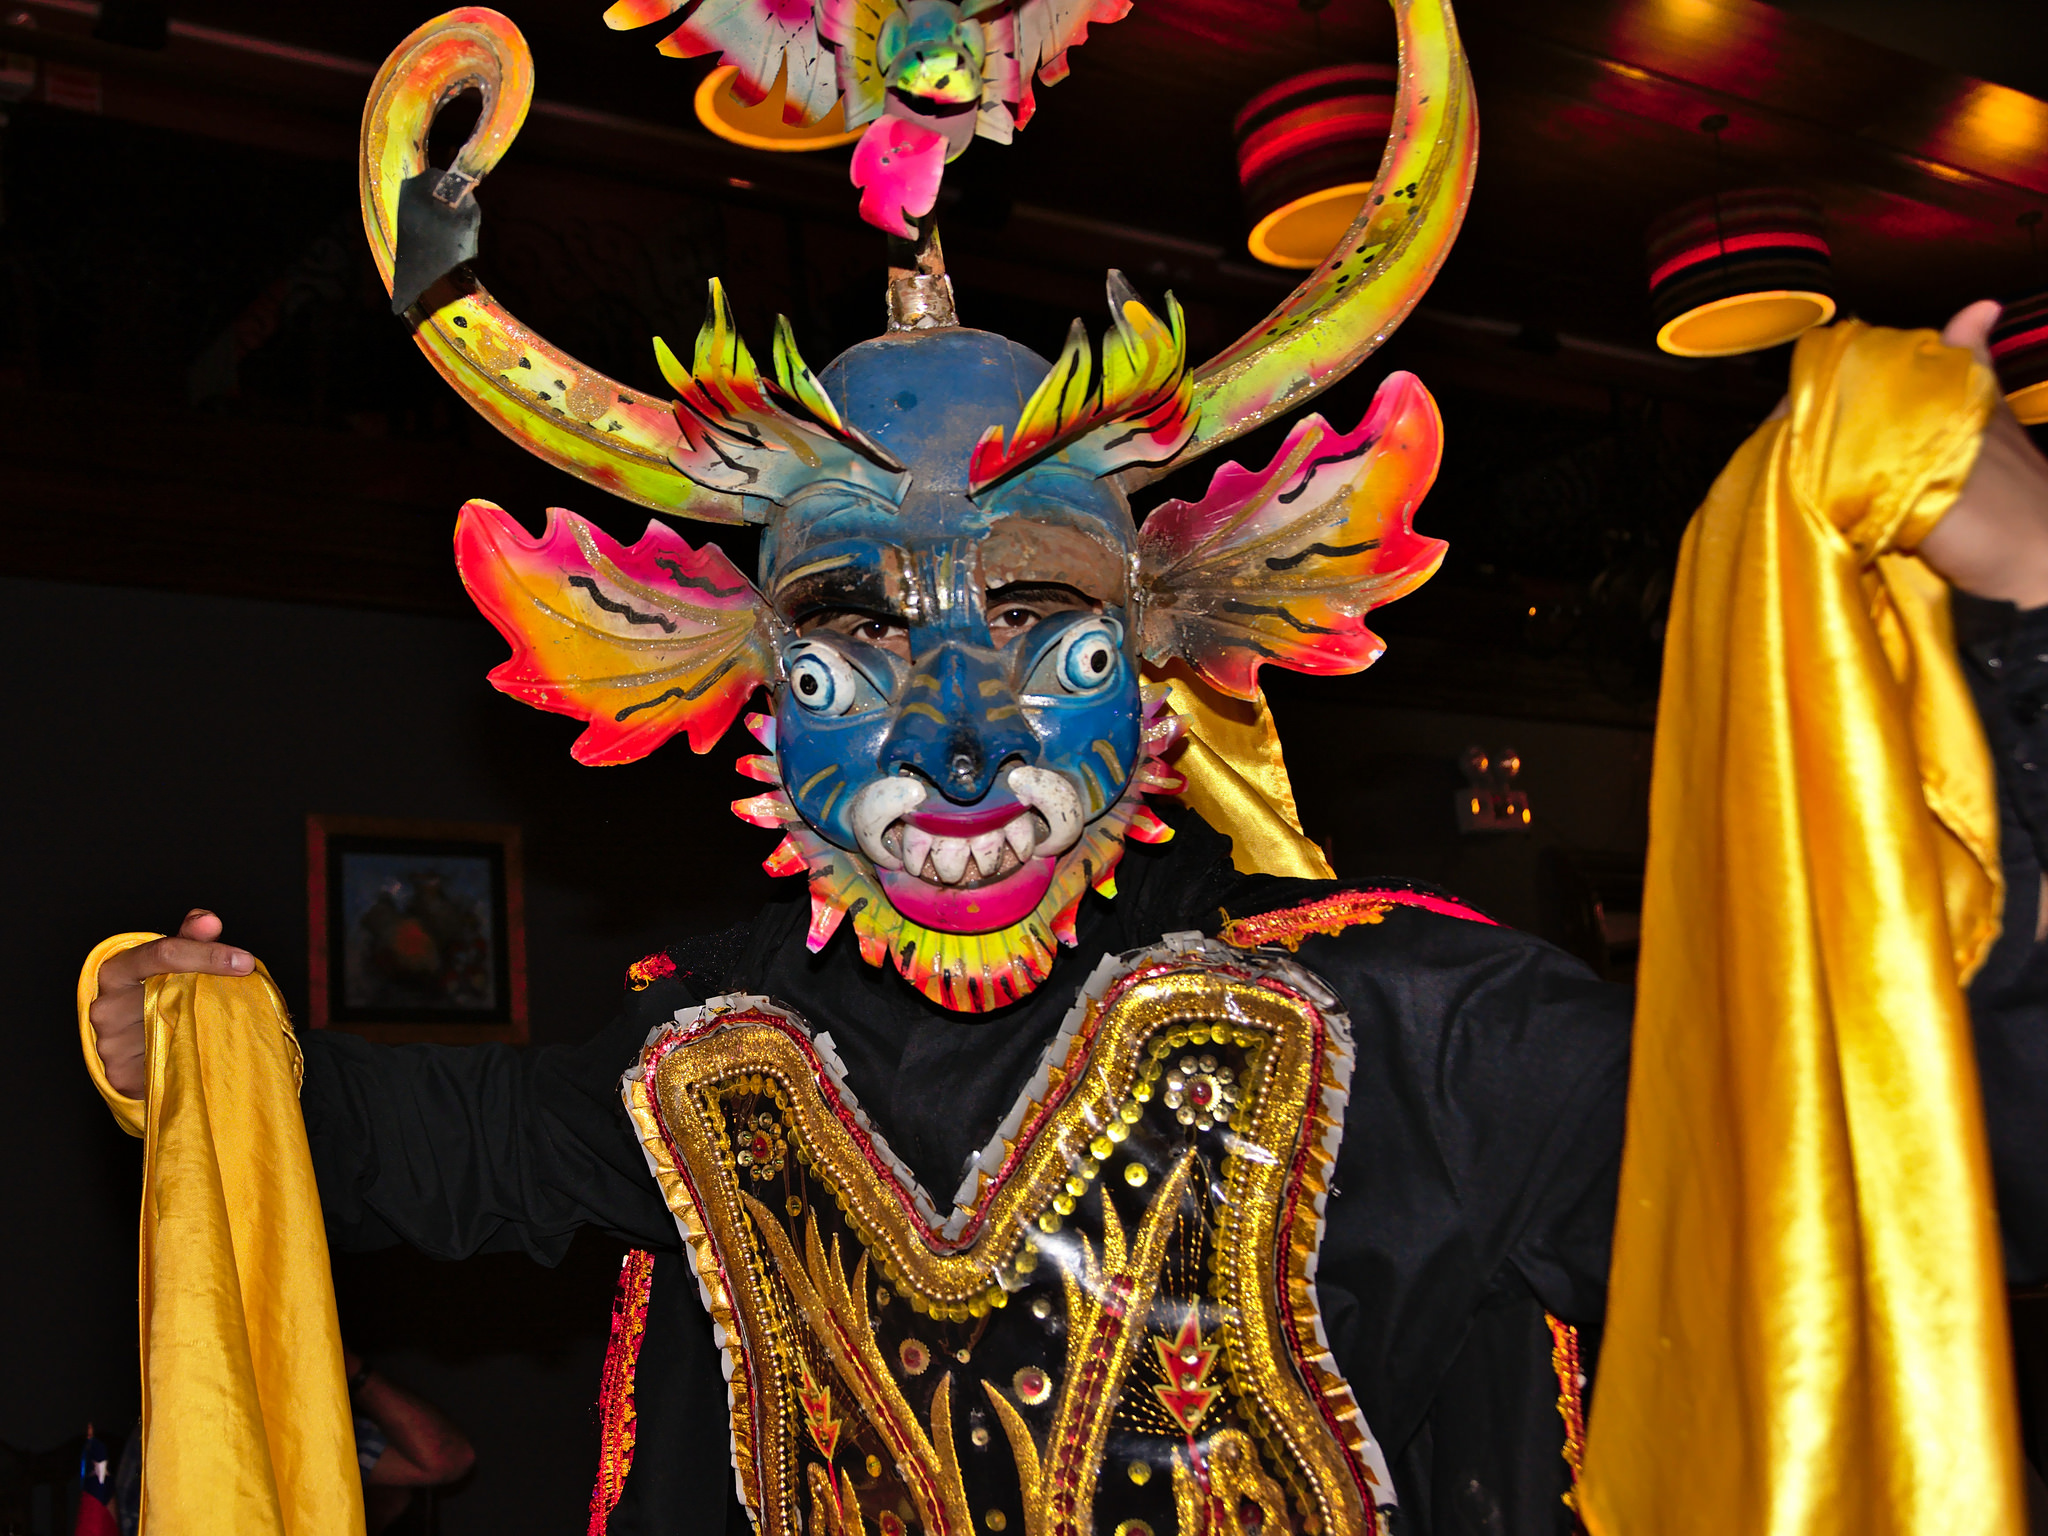 Участник танца в Перу